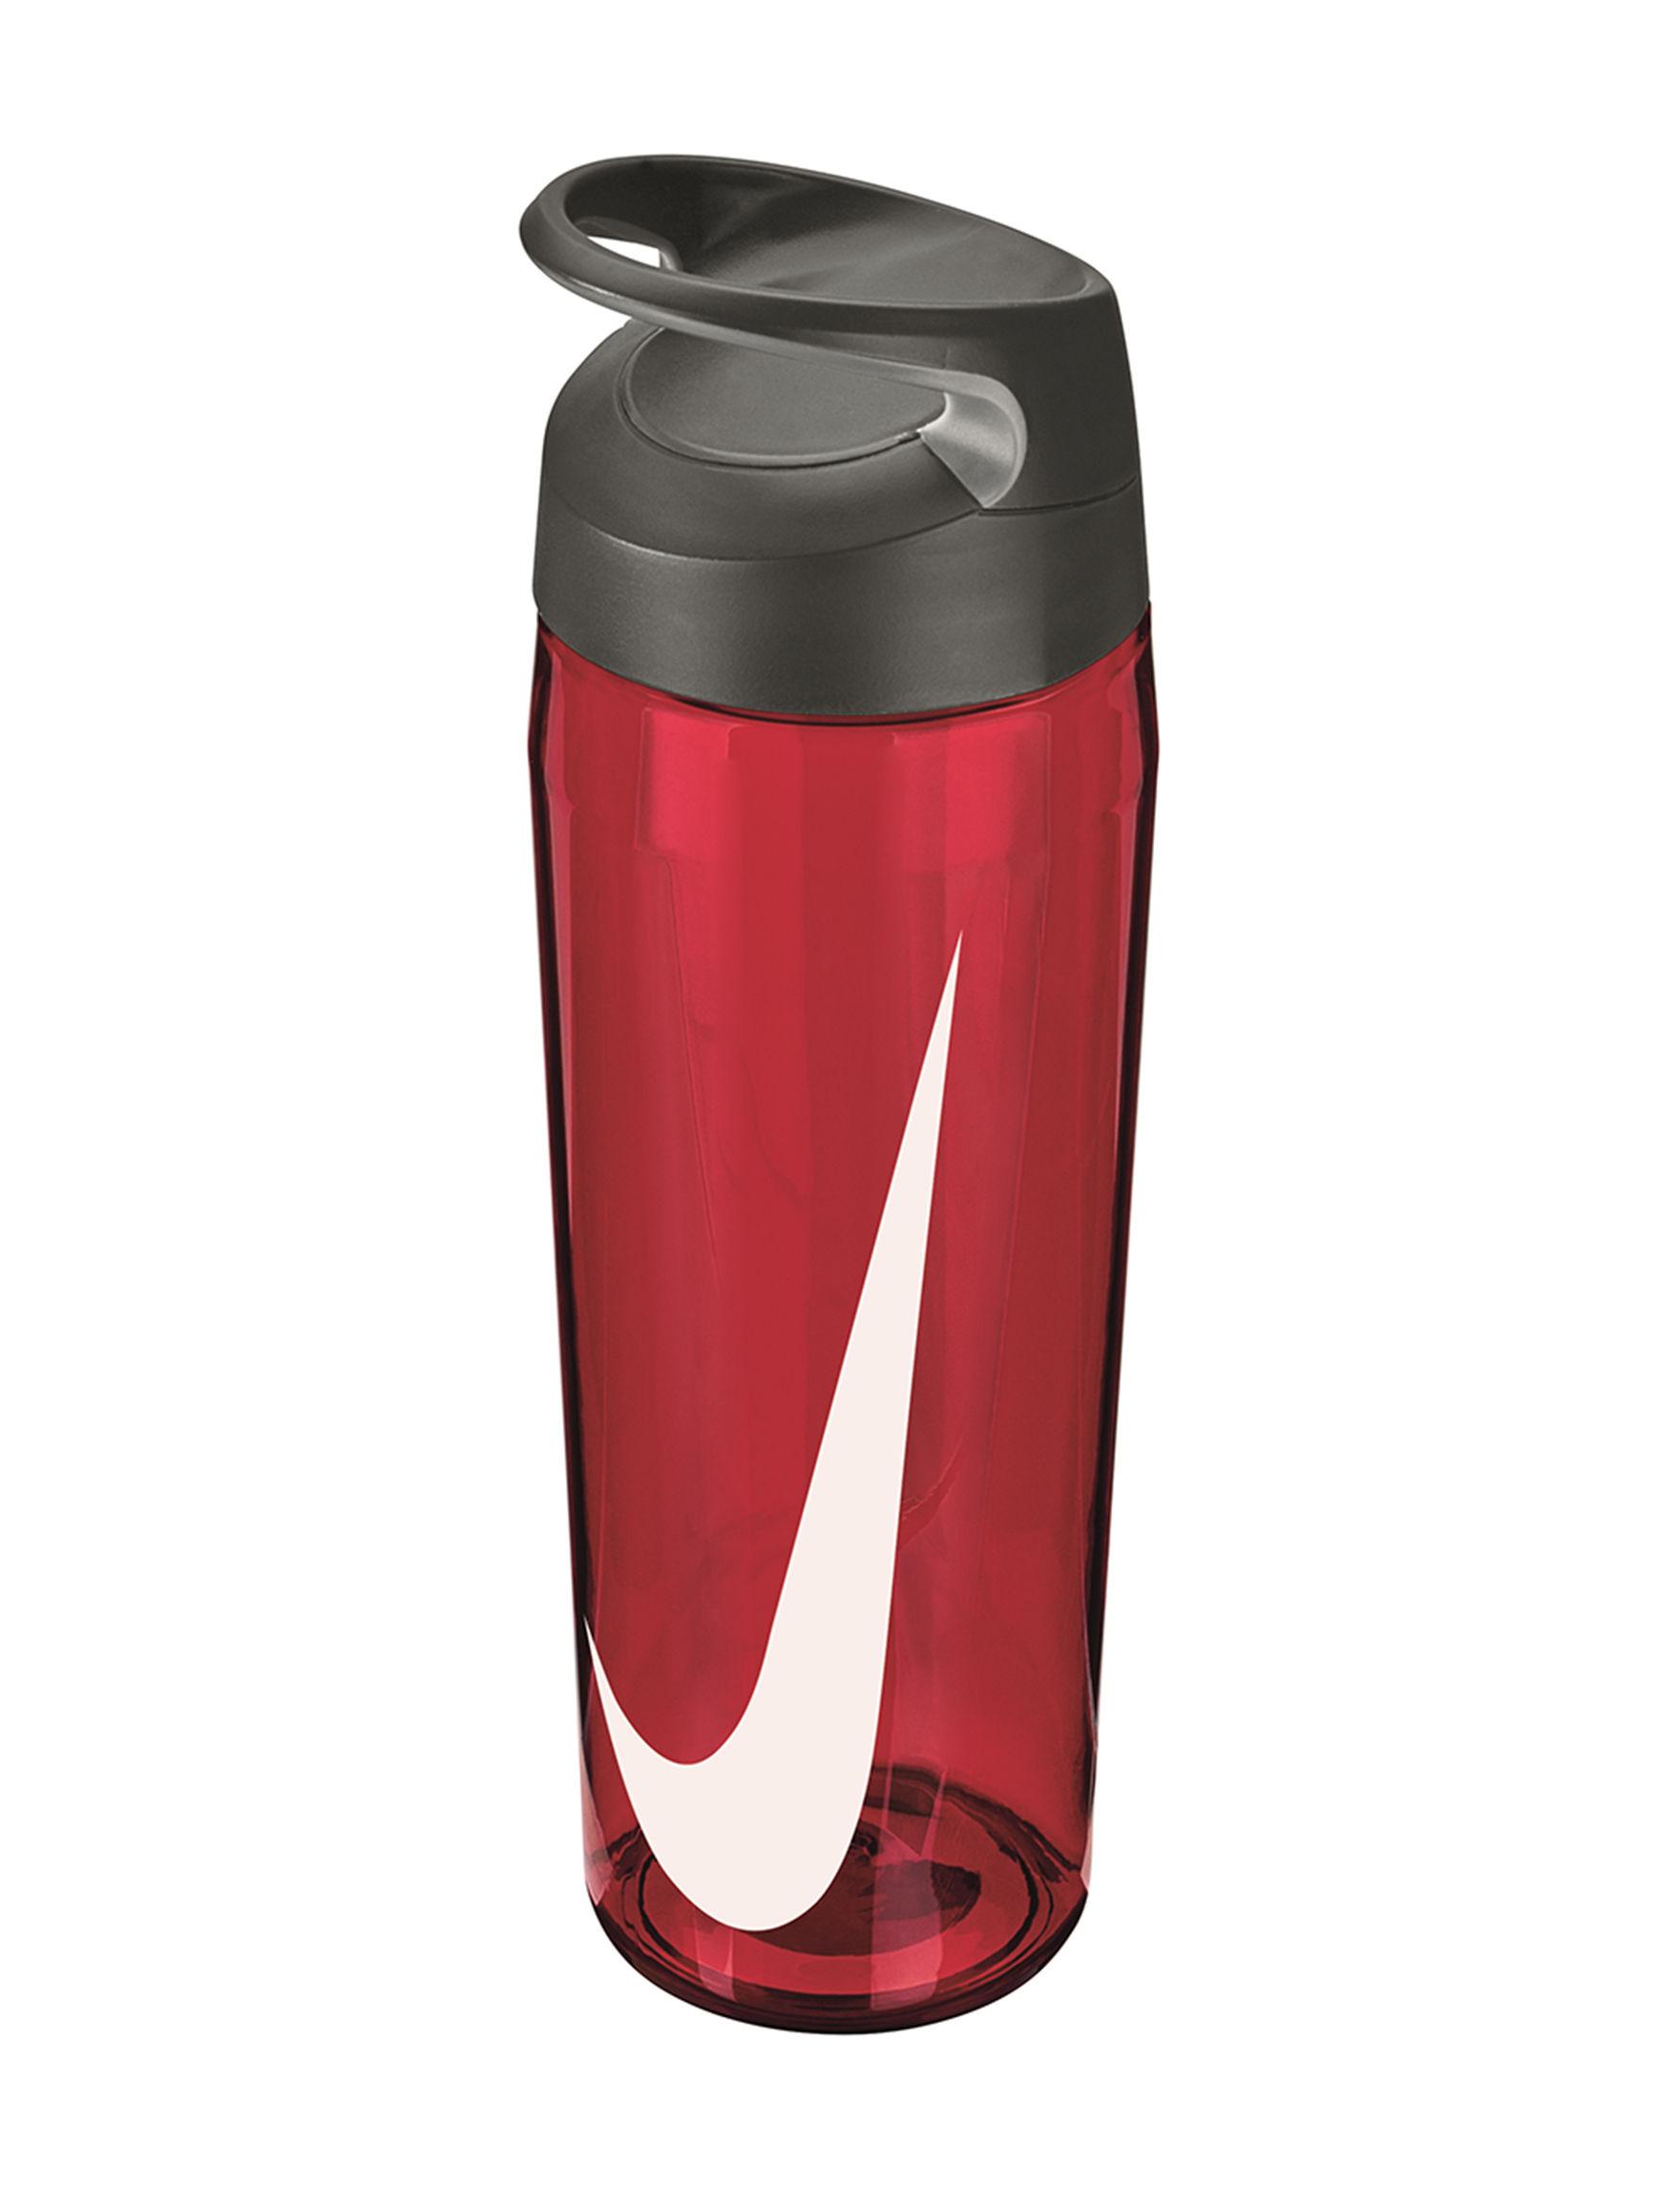 Nike Red Water Bottles Drinkware